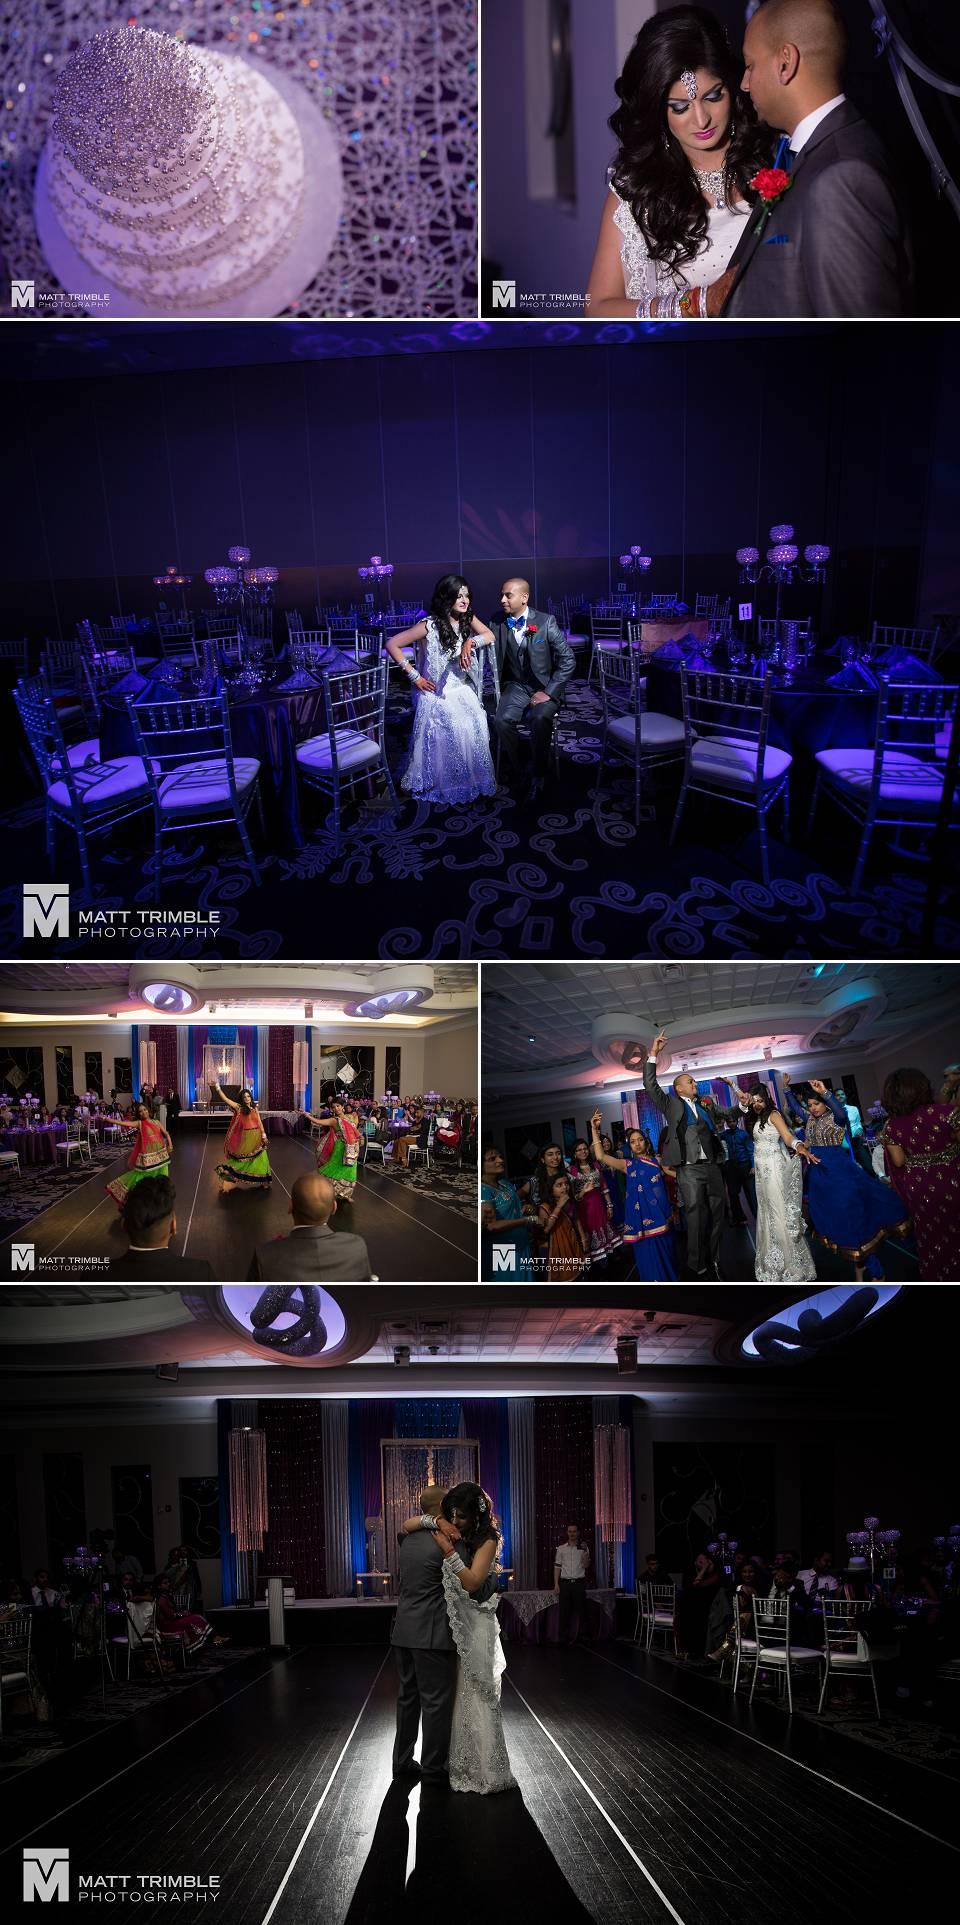 wedding reception at the Apollo Banquet Hall